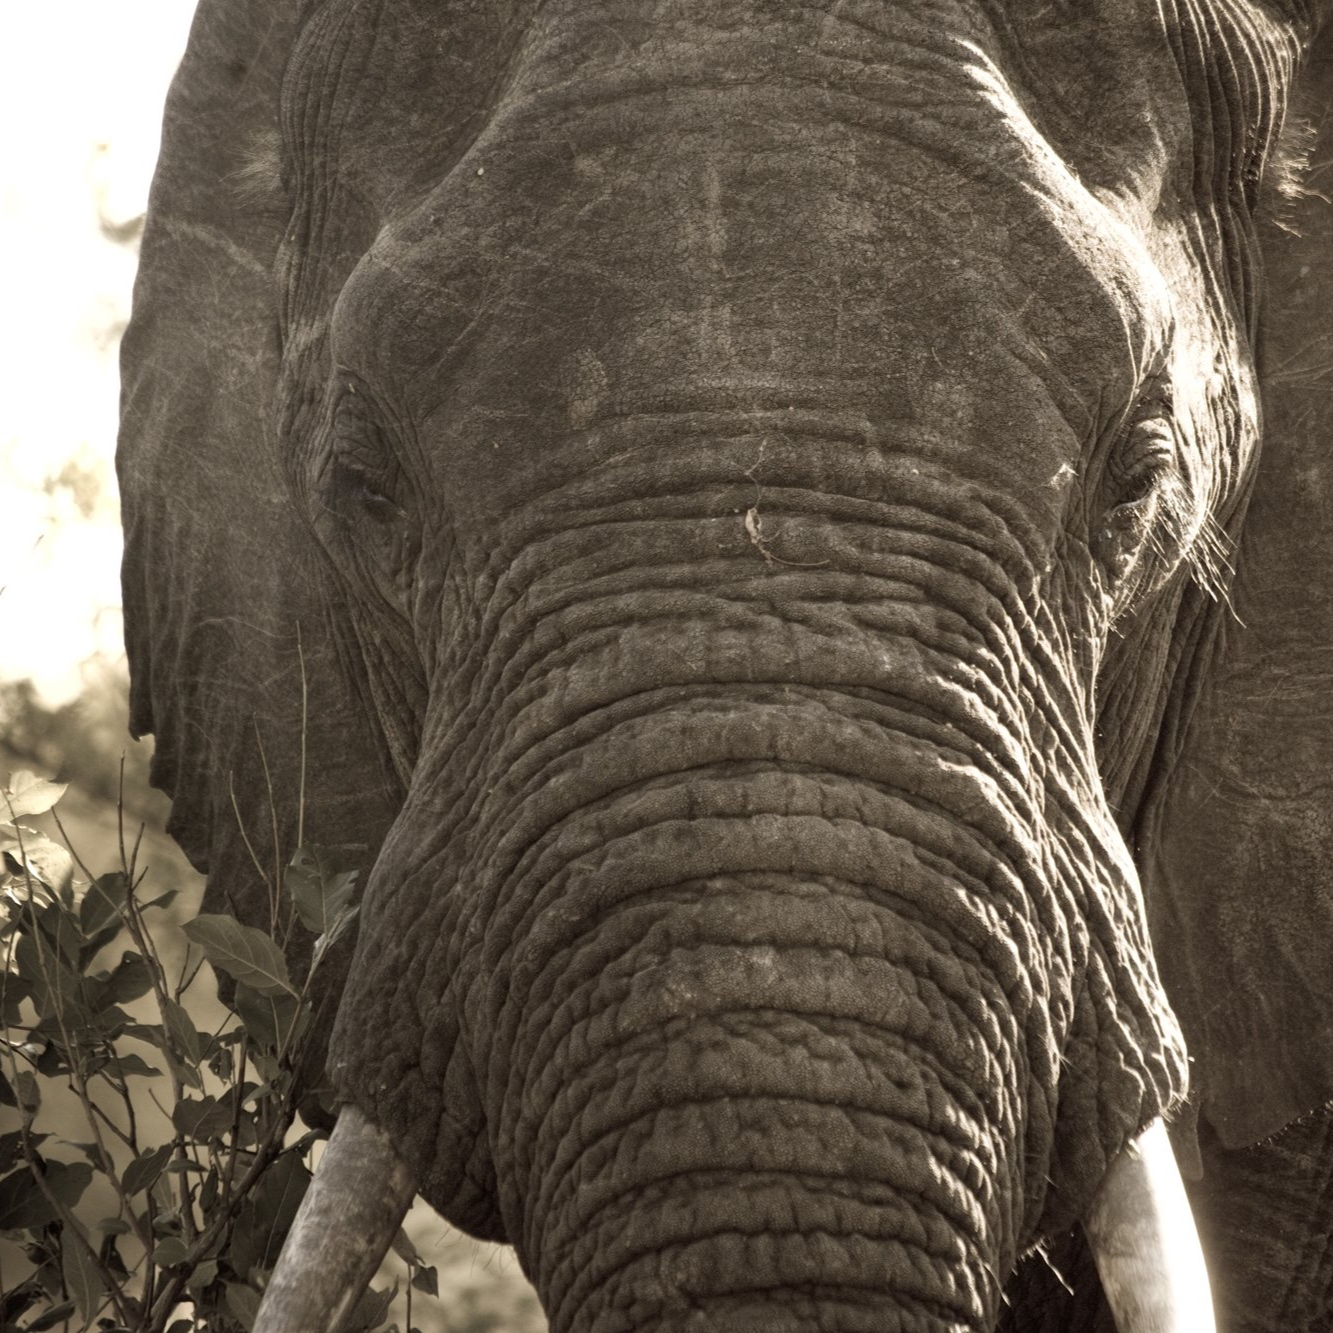 african-elephant-close-up.jpg